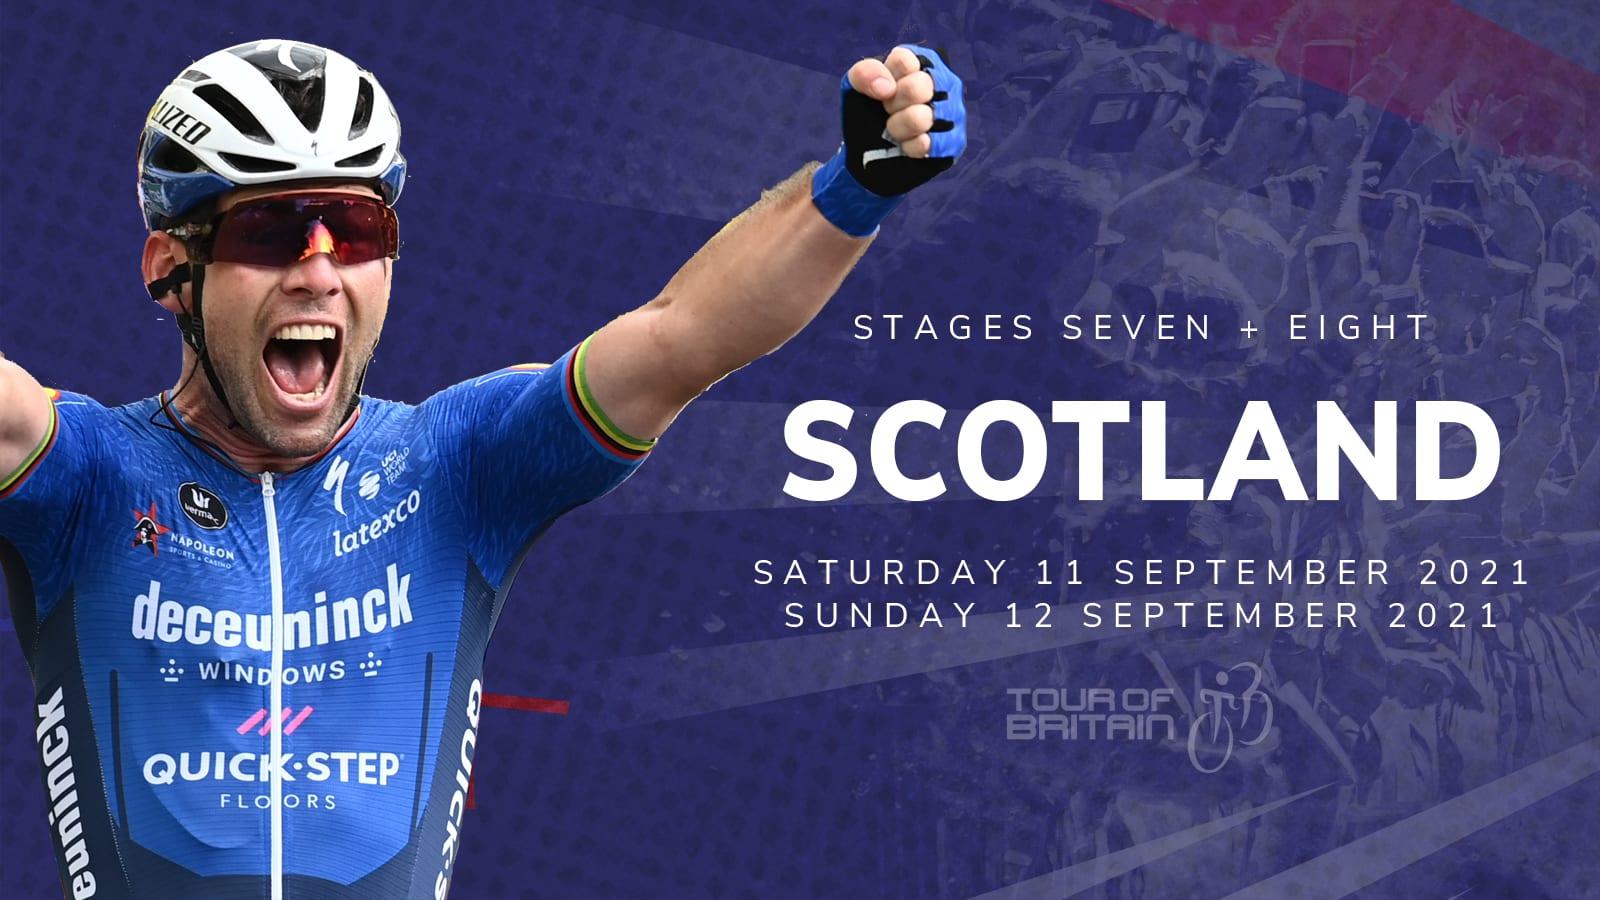 Tour of Britain Scotland 2021